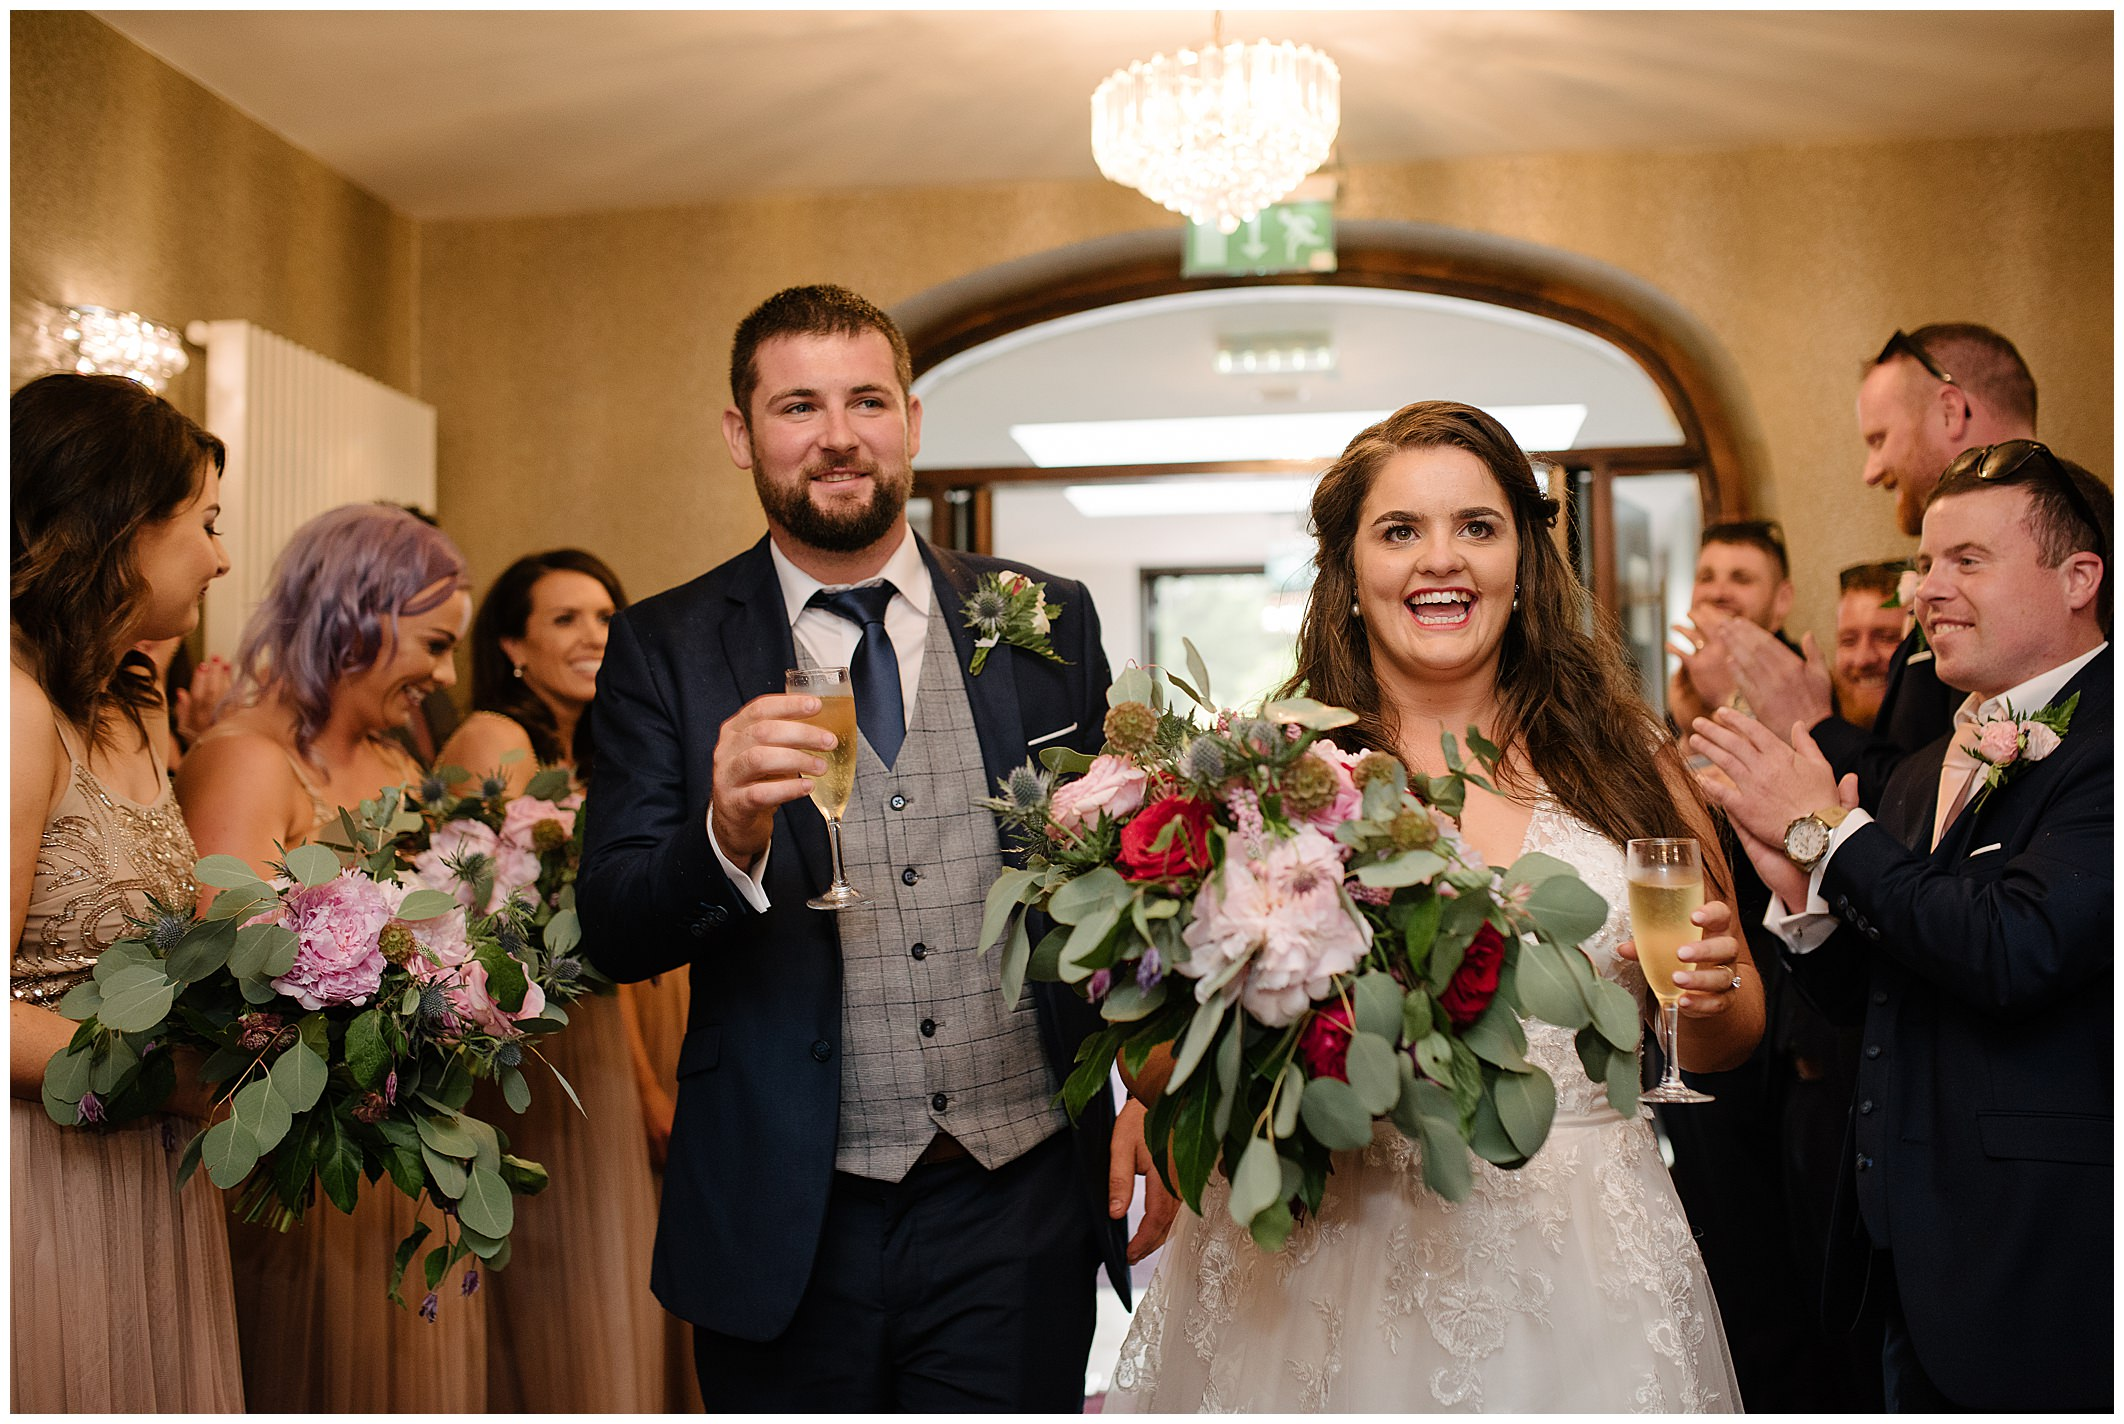 redcastle-hotel-wedding-karen-brian-jude-browne-photography-108.jpg